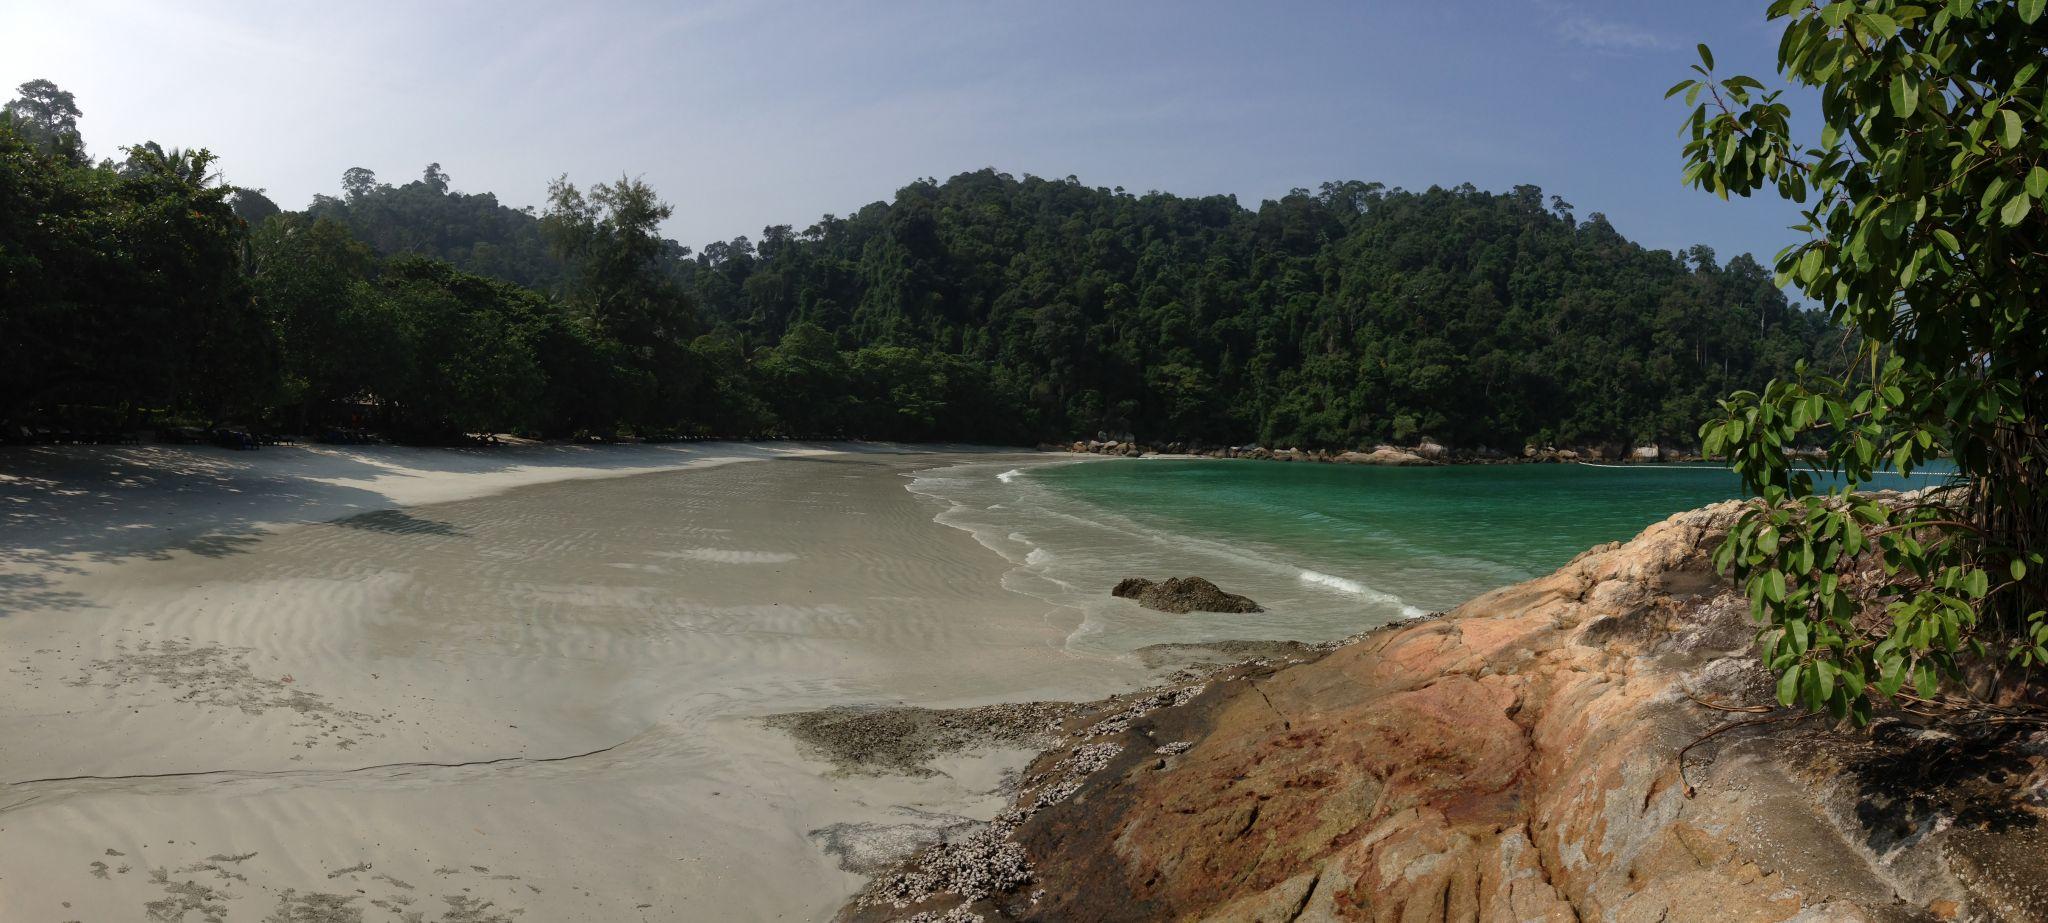 Alone at Emerald Bay, Malaysia